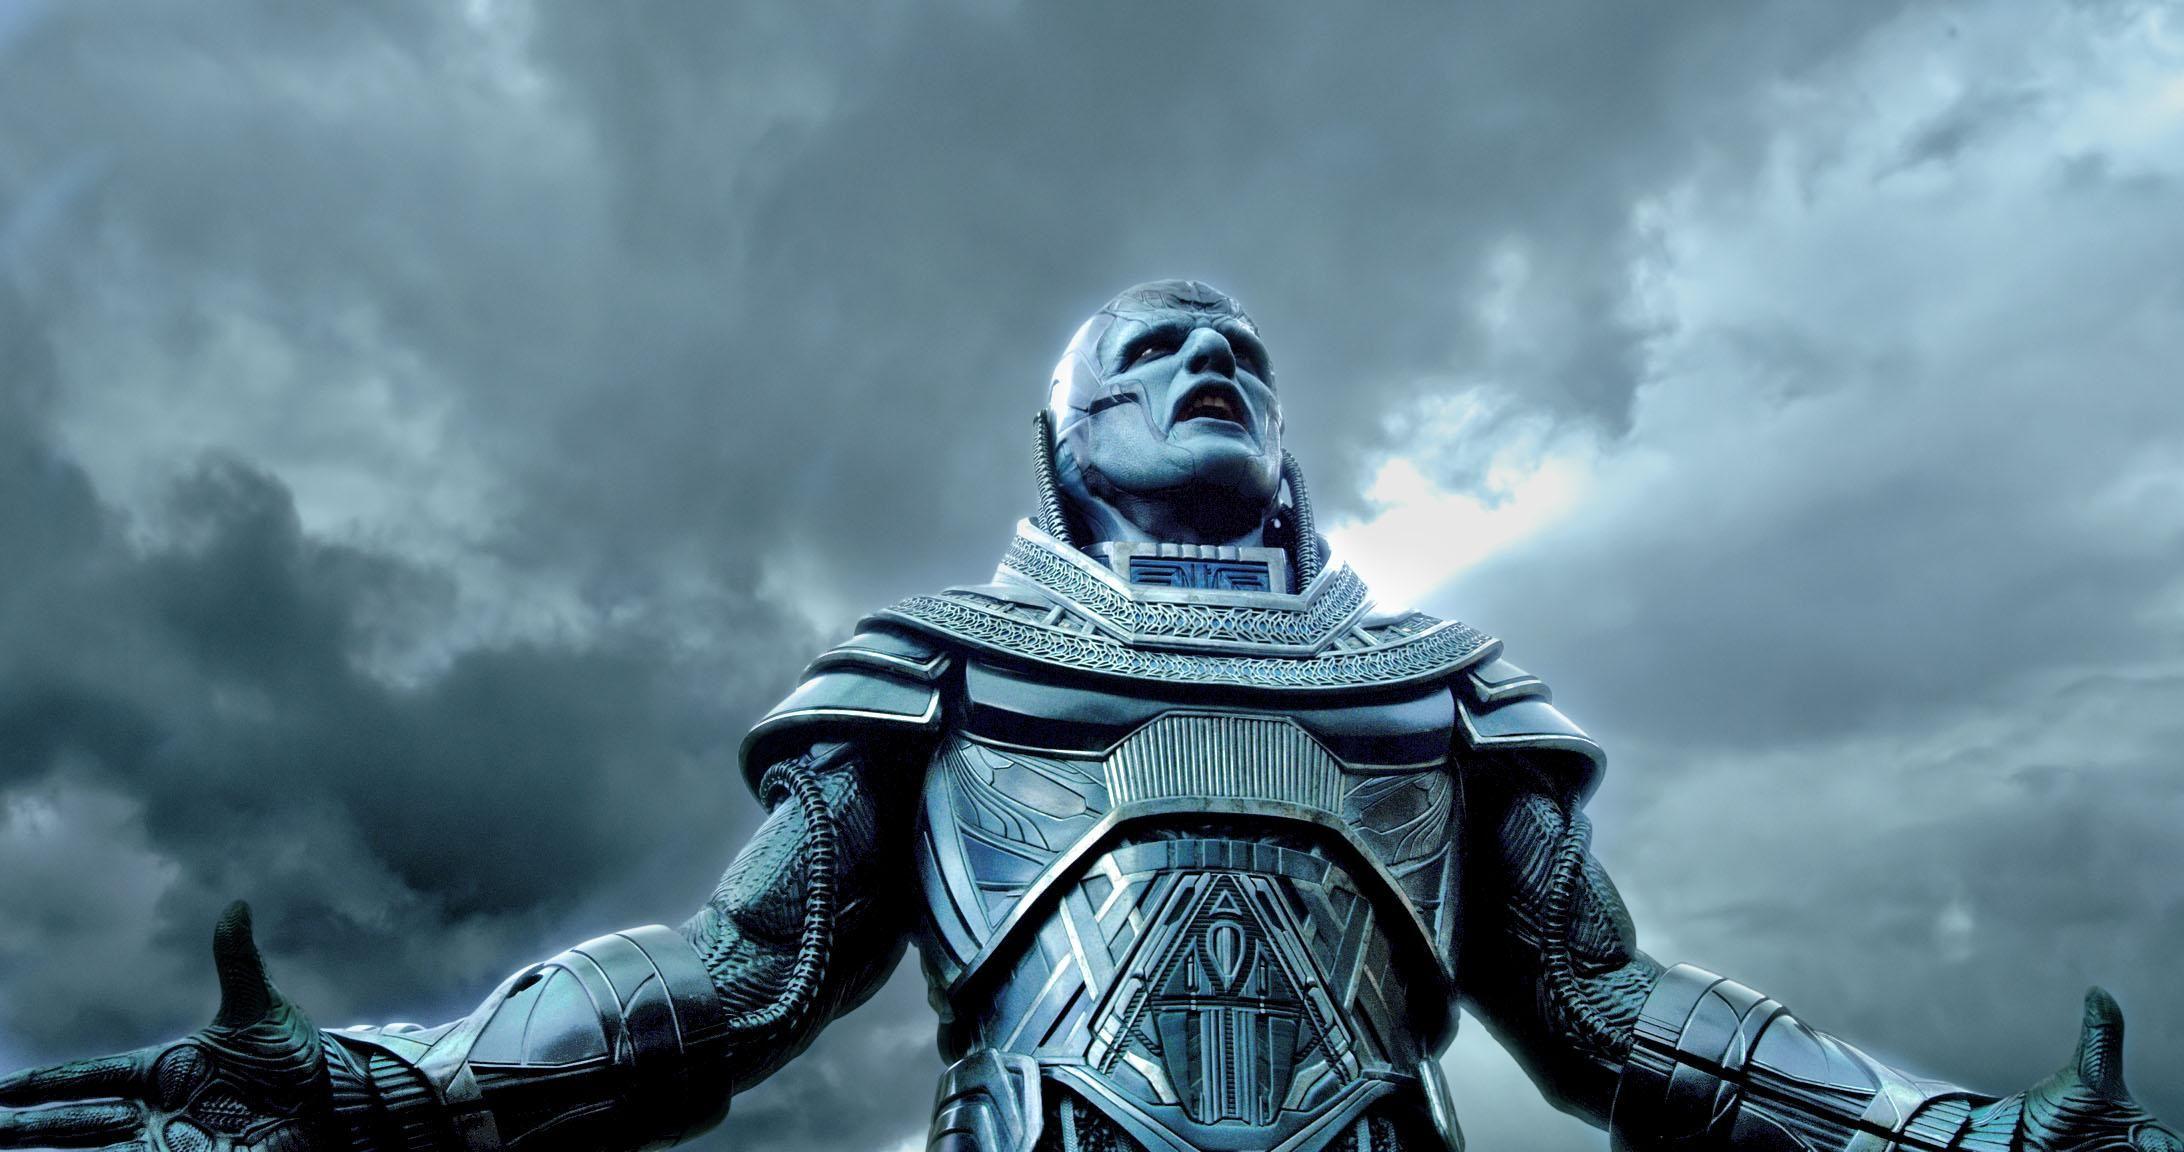 X Men Days Of Future Past Apocalypse Bryan Singer Teases X-...